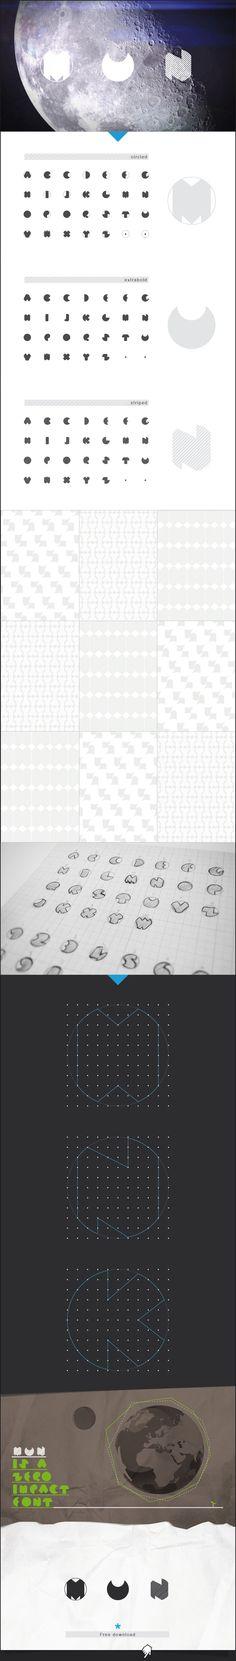 Mun typeface - Free experimental font by Vincenzo Vuono, via Behance